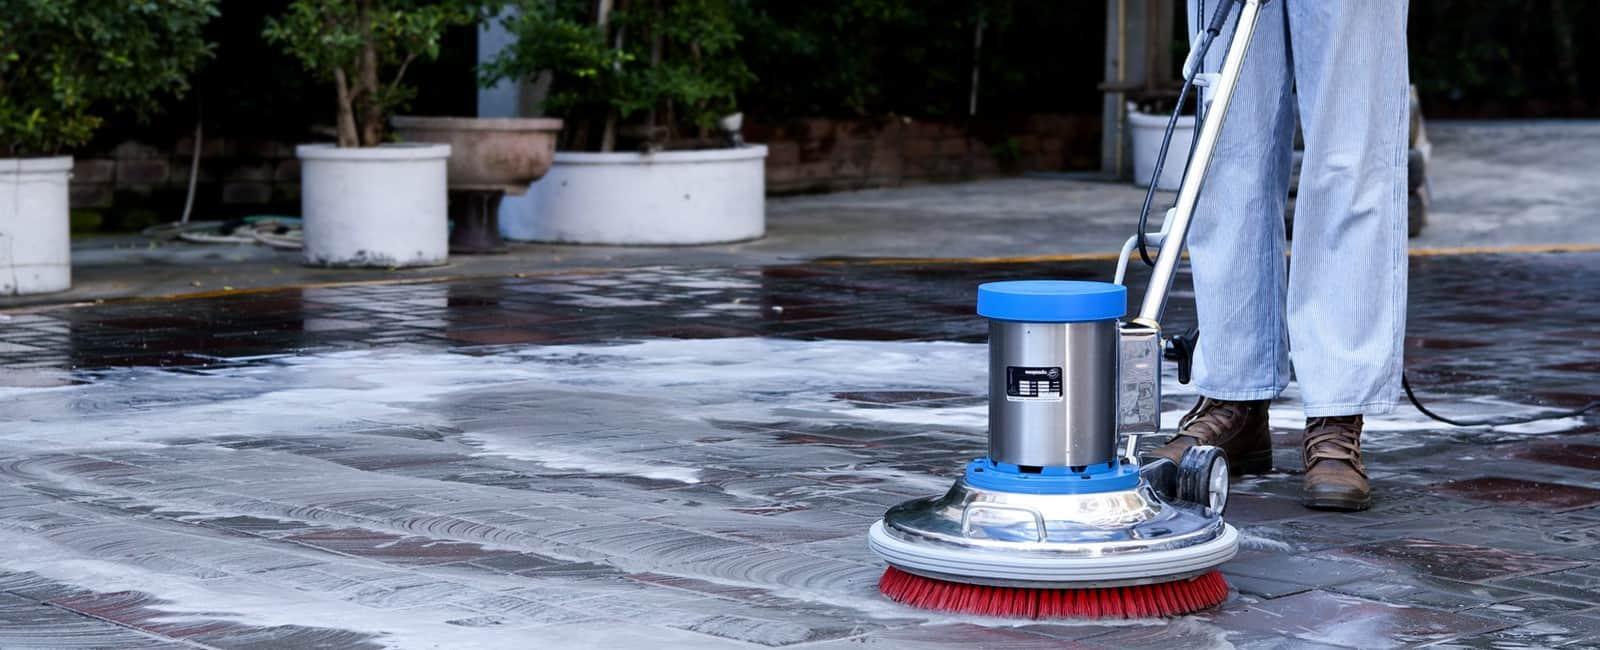 añ++F-ºó-¦++T¦-floor-scrubber